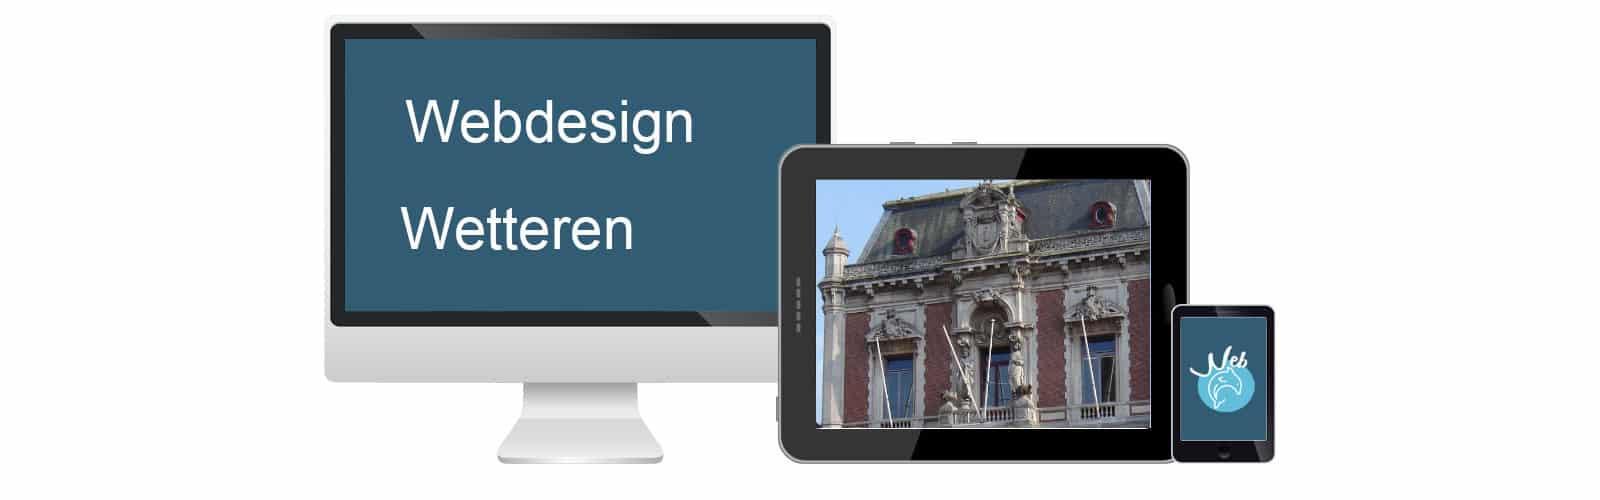 Webdesign Wetteren - webdolfijn